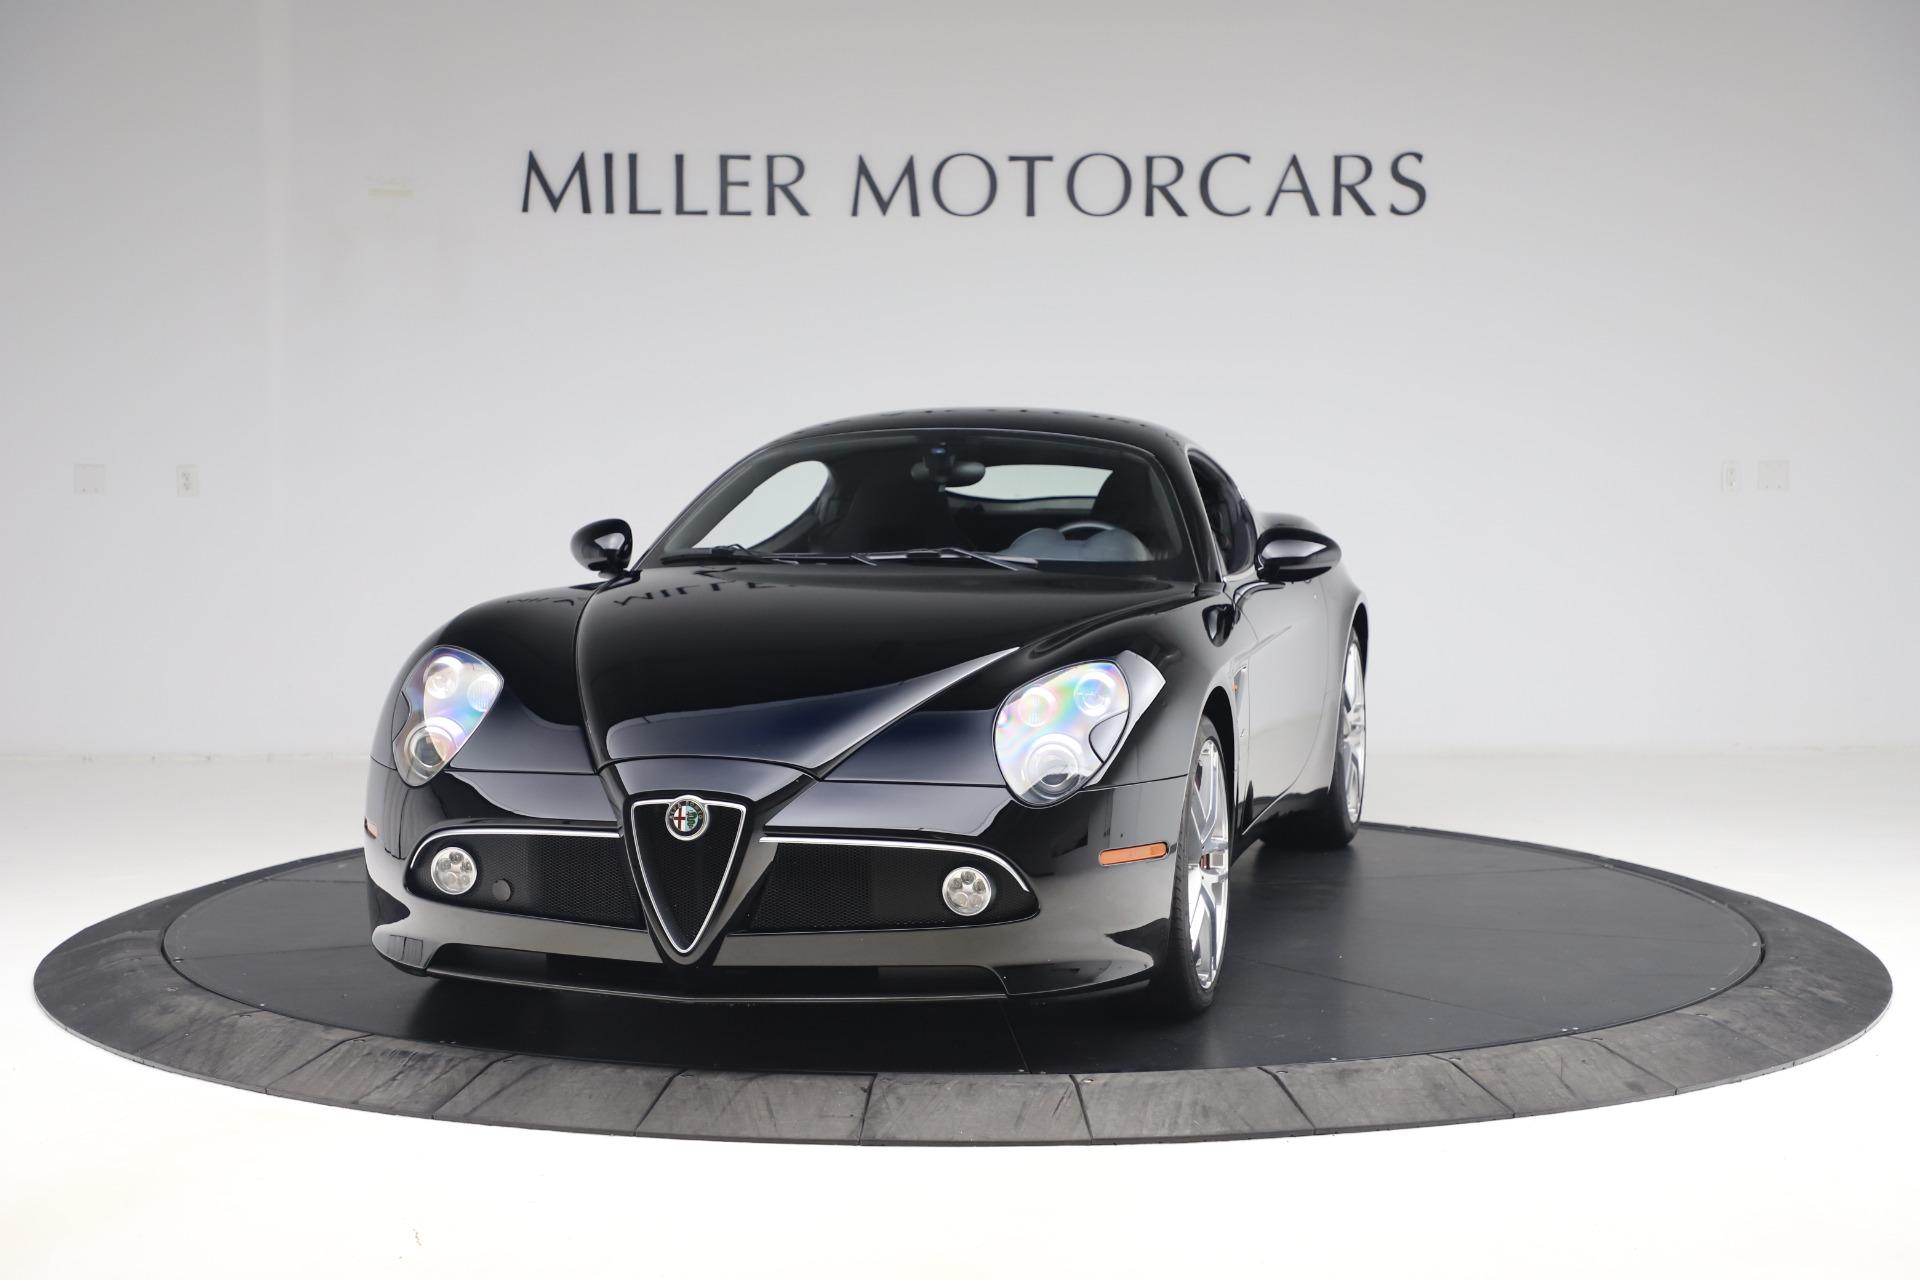 Used 2008 Alfa Romeo 8C Competizione for sale $339,900 at Alfa Romeo of Westport in Westport CT 06880 1